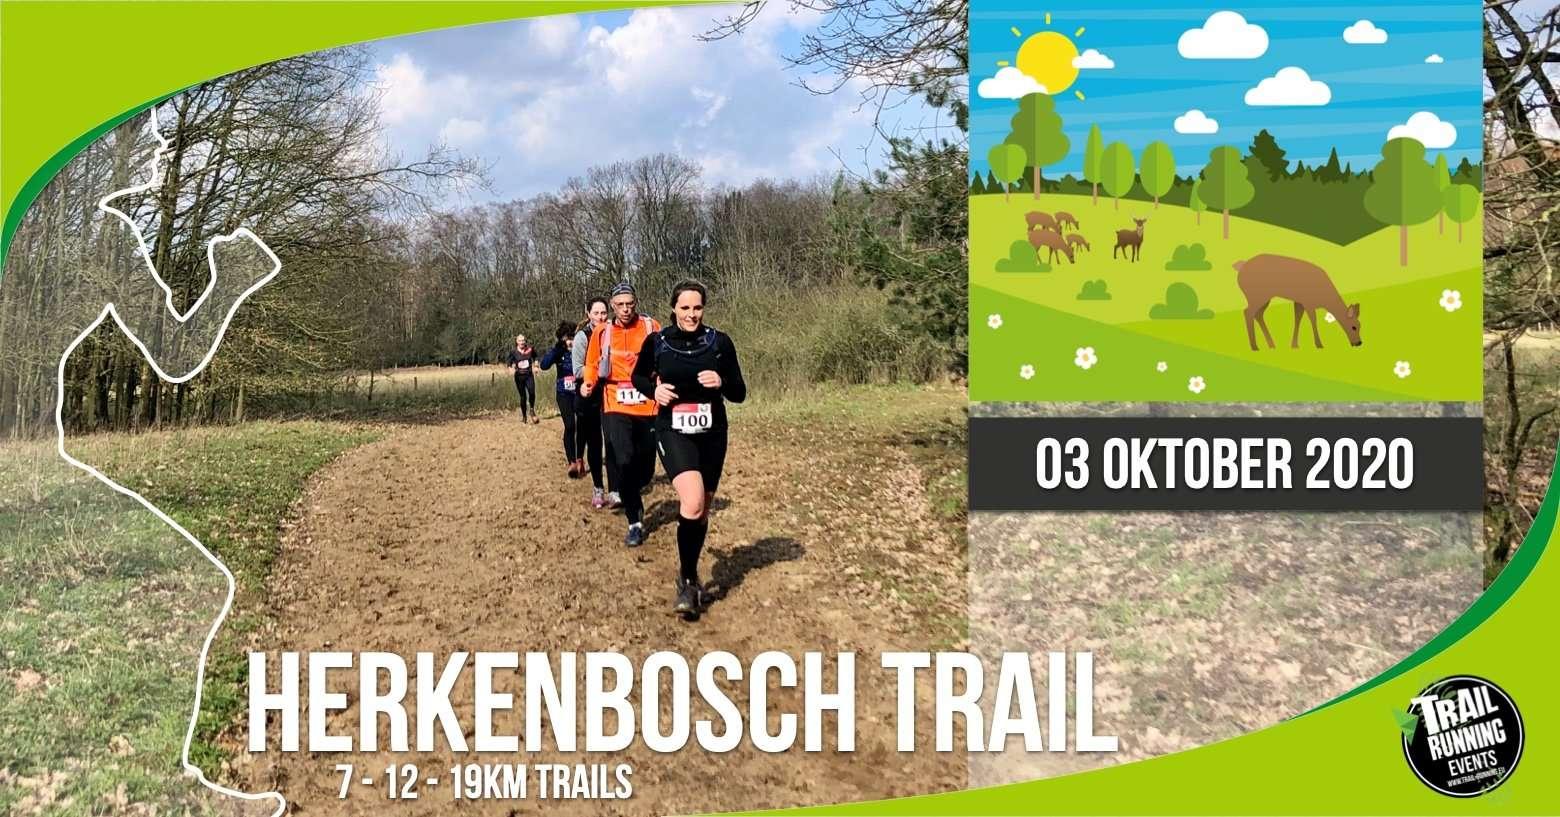 Herkenbosch-Trail-03-10-2020